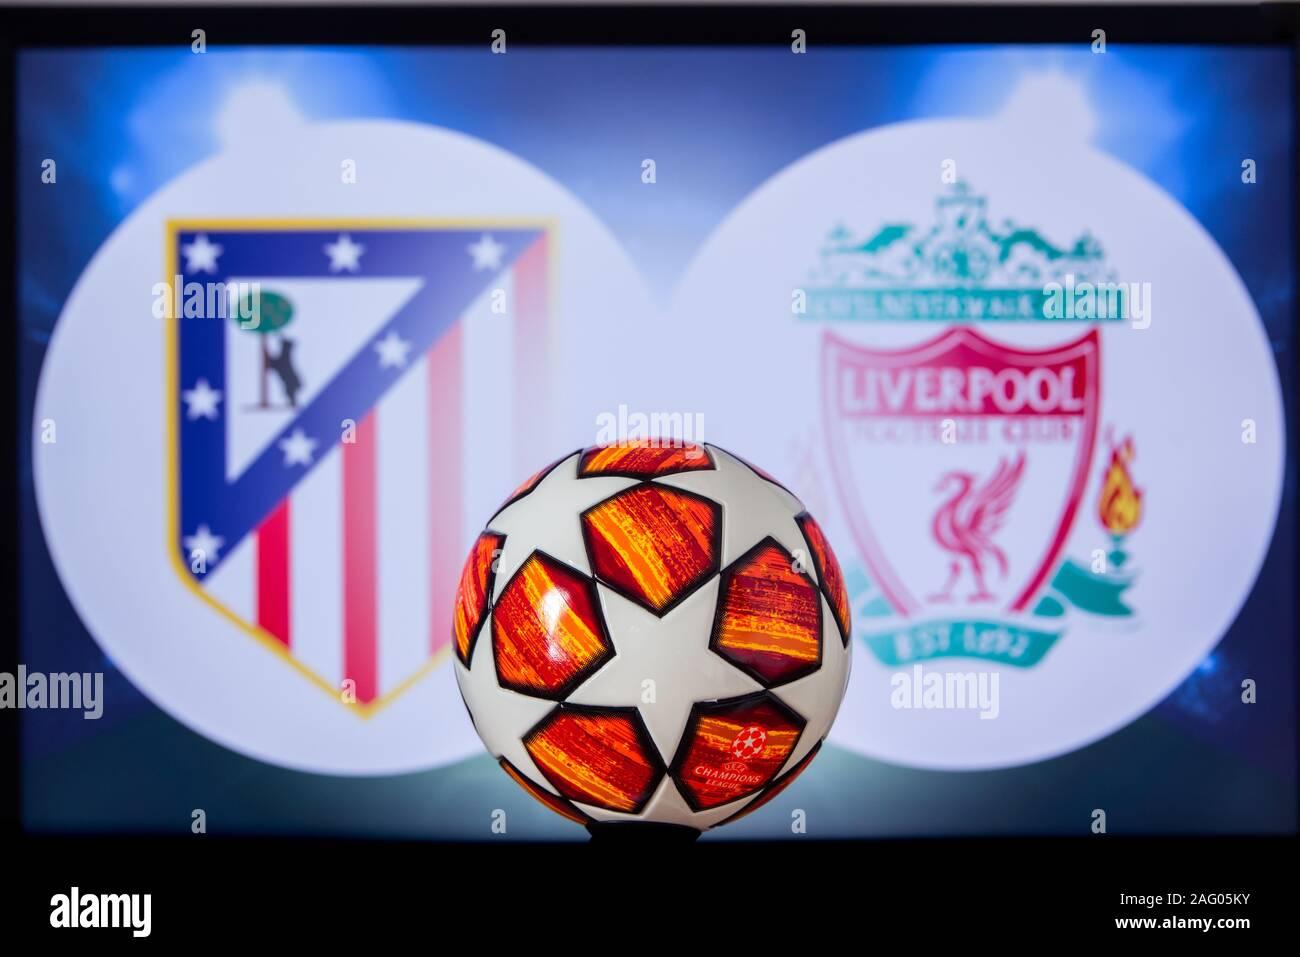 uefa champions league 2020 uefa champions league fixtures schedule 2019 2020 gmt uk et cet 2019 11 28 solano labs